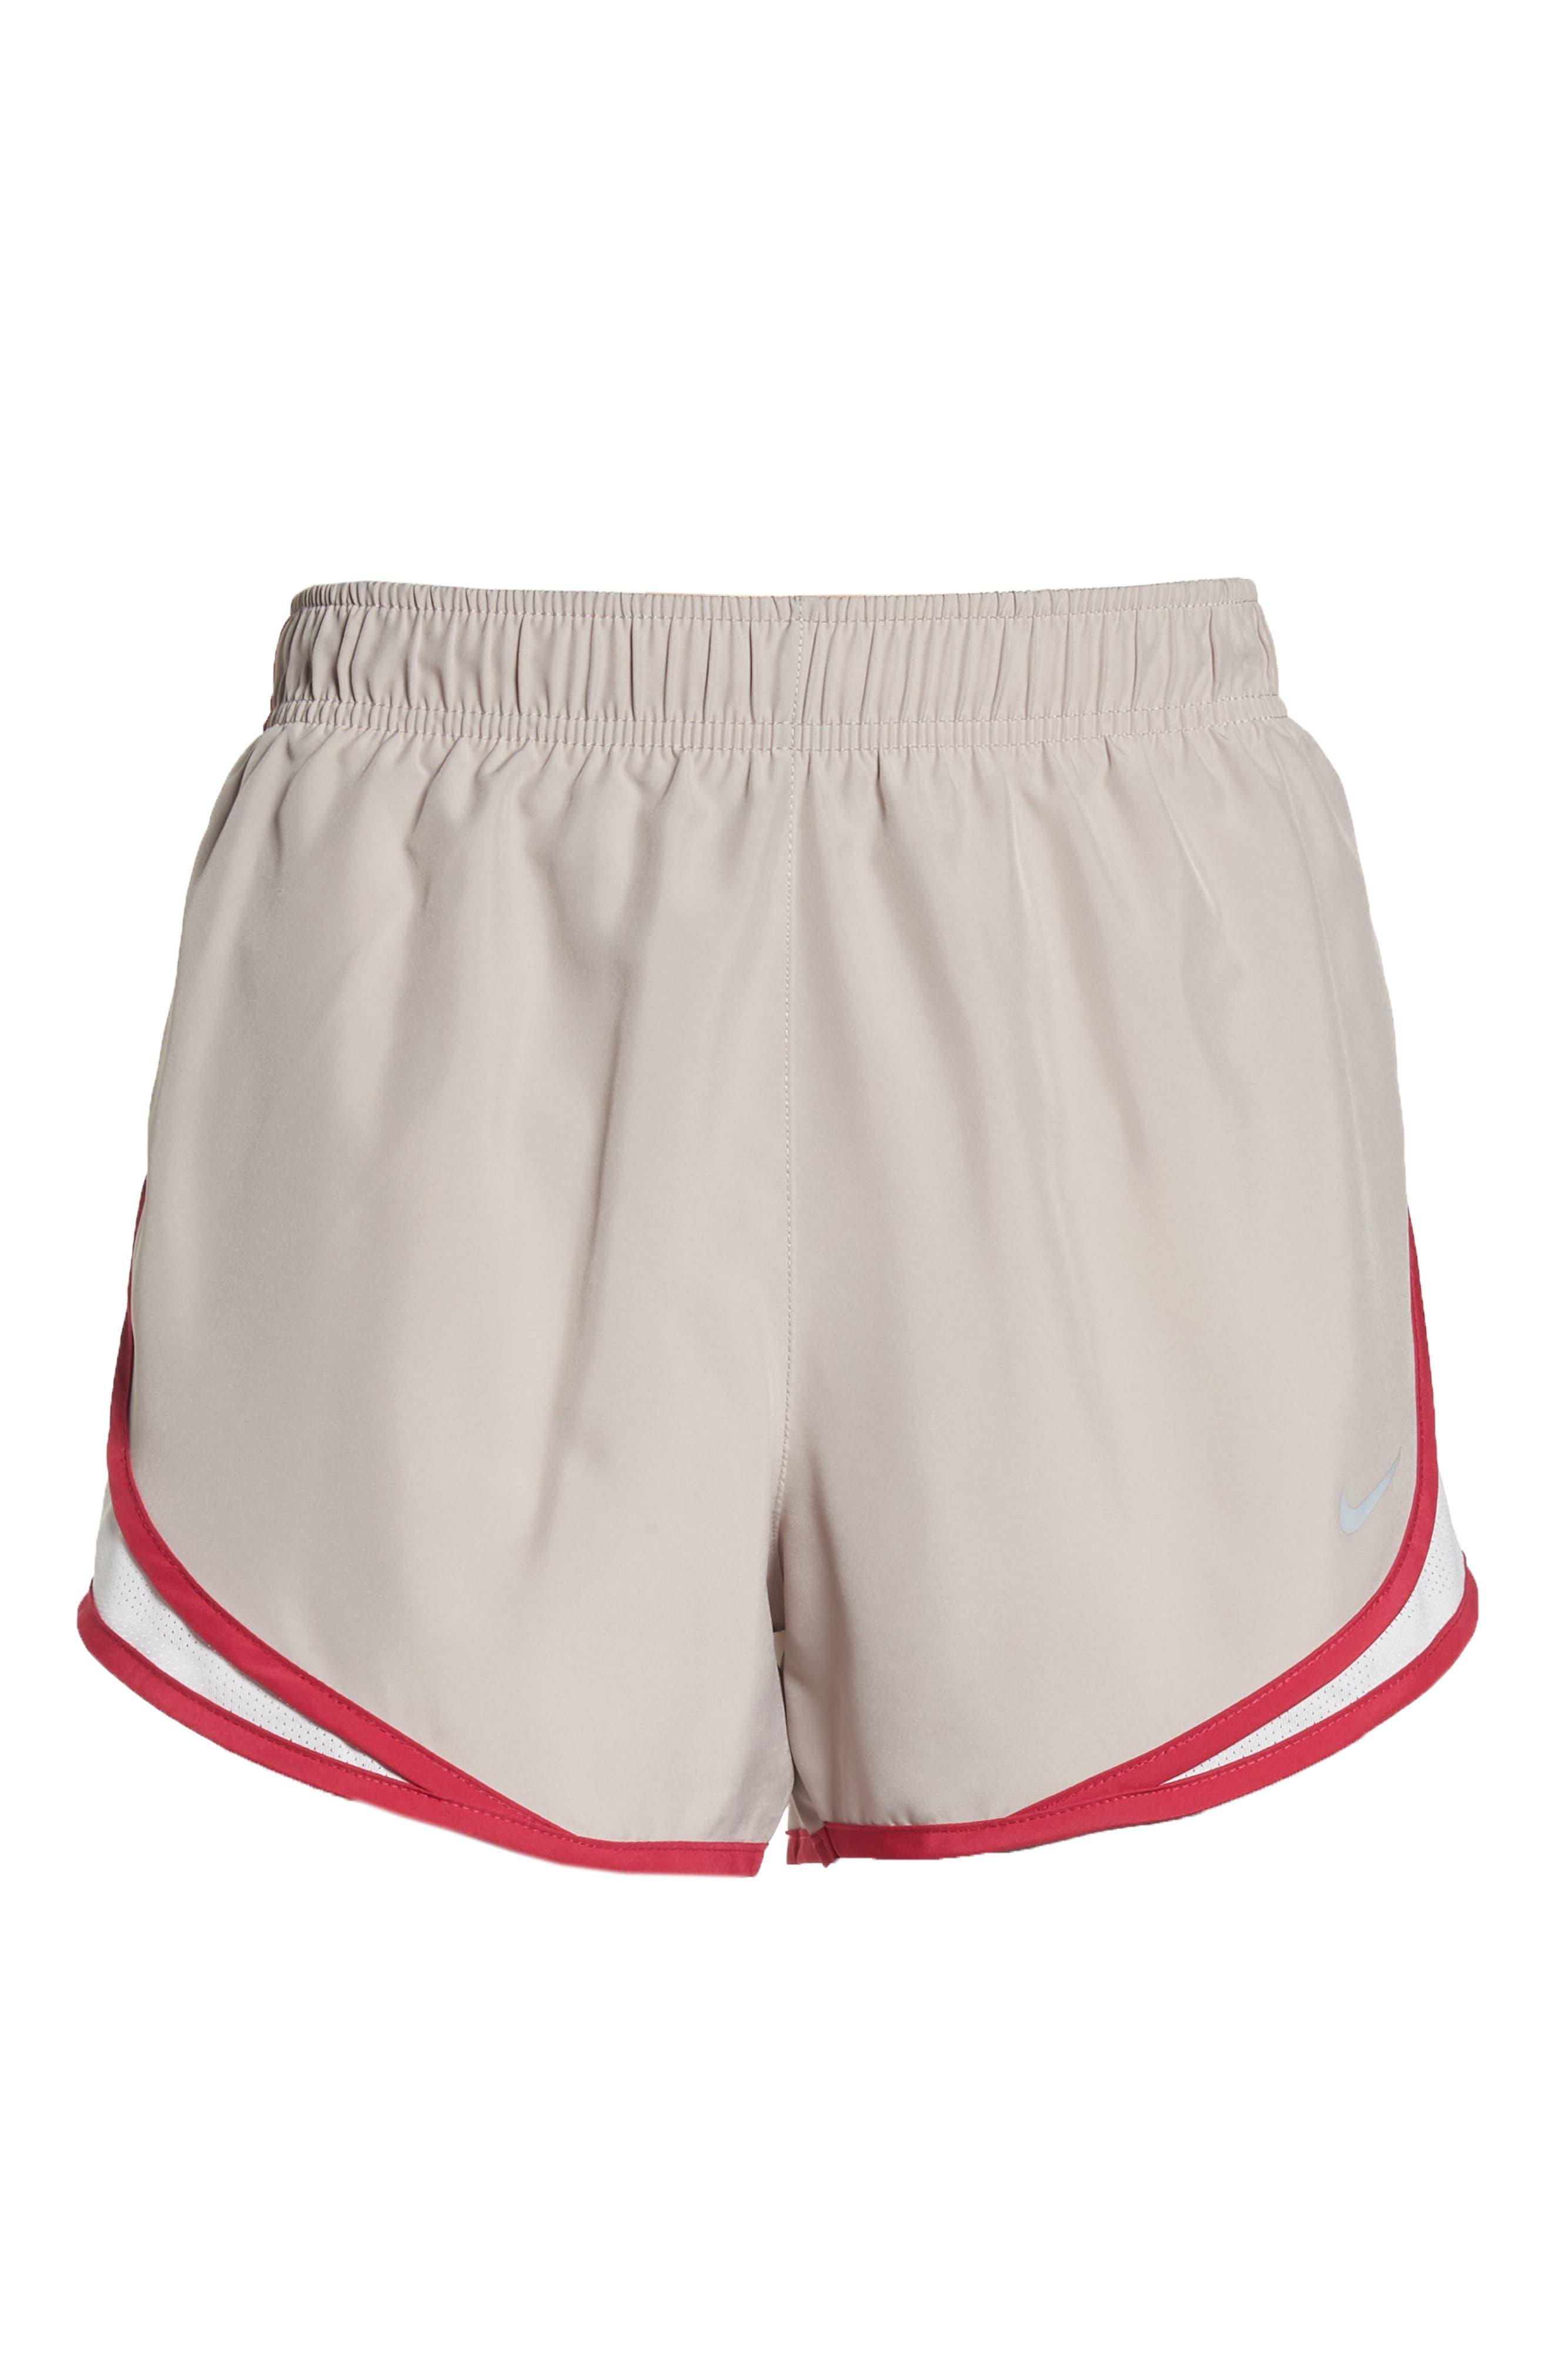 Dry Tempo Running Shorts,                             Alternate thumbnail 432, color,